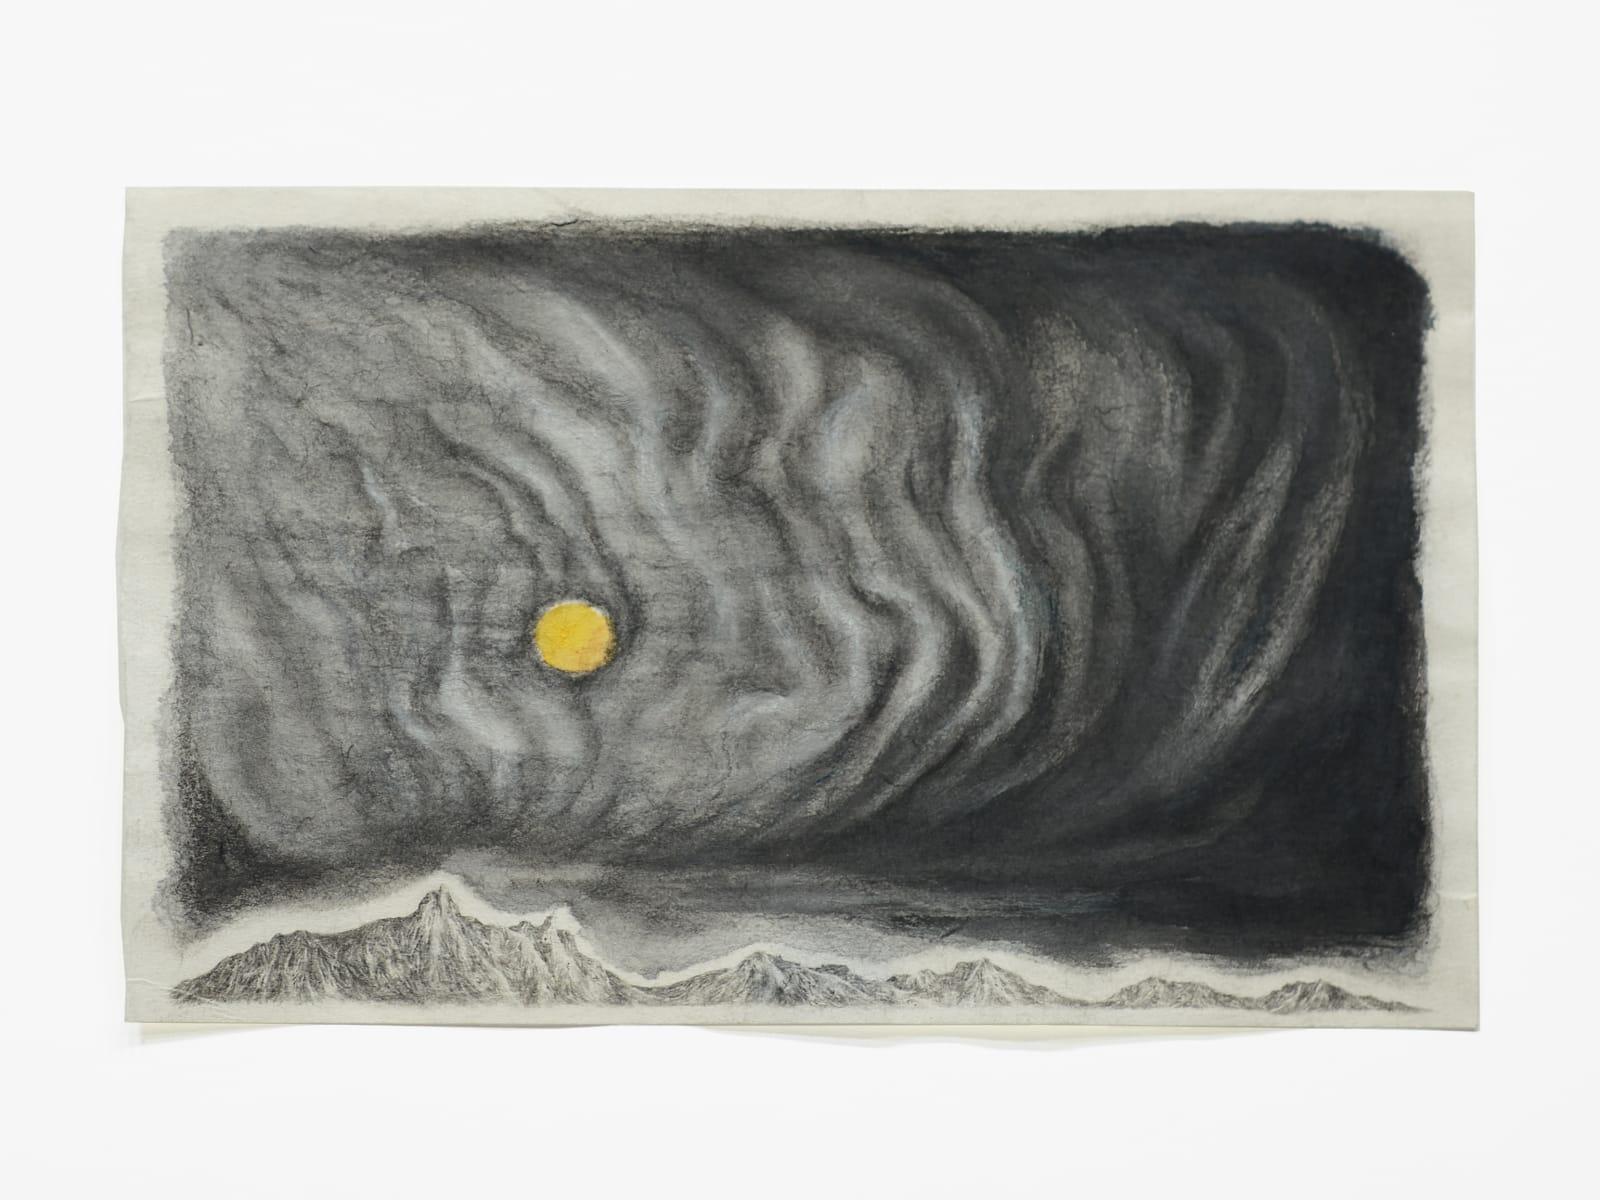 Robyn O'Neil Concern in Black, 2020 graphite, watercolor, ink 5 3/4 x 9 1/4 in (14.6 x 23.5 cm) 13 x 18 3/8 x 1 1/2 in (33 x 46.7 x 3.8 cm) framed RON 170 SOLD